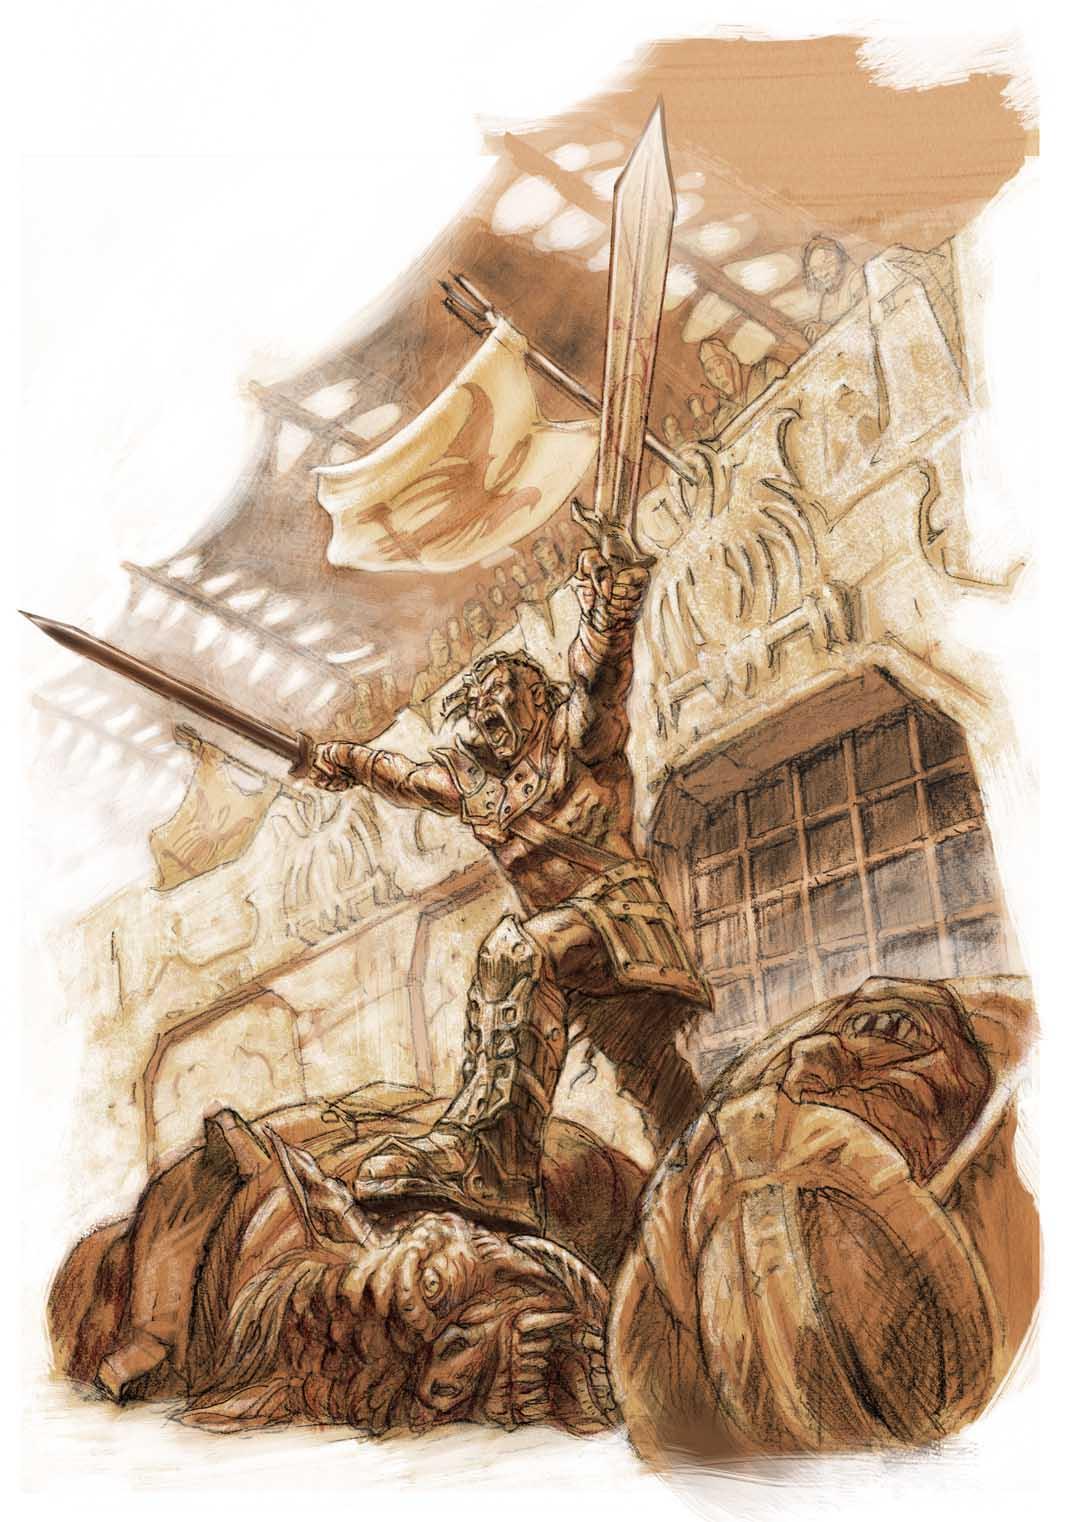 13th Age: Half-Orc Gladiator